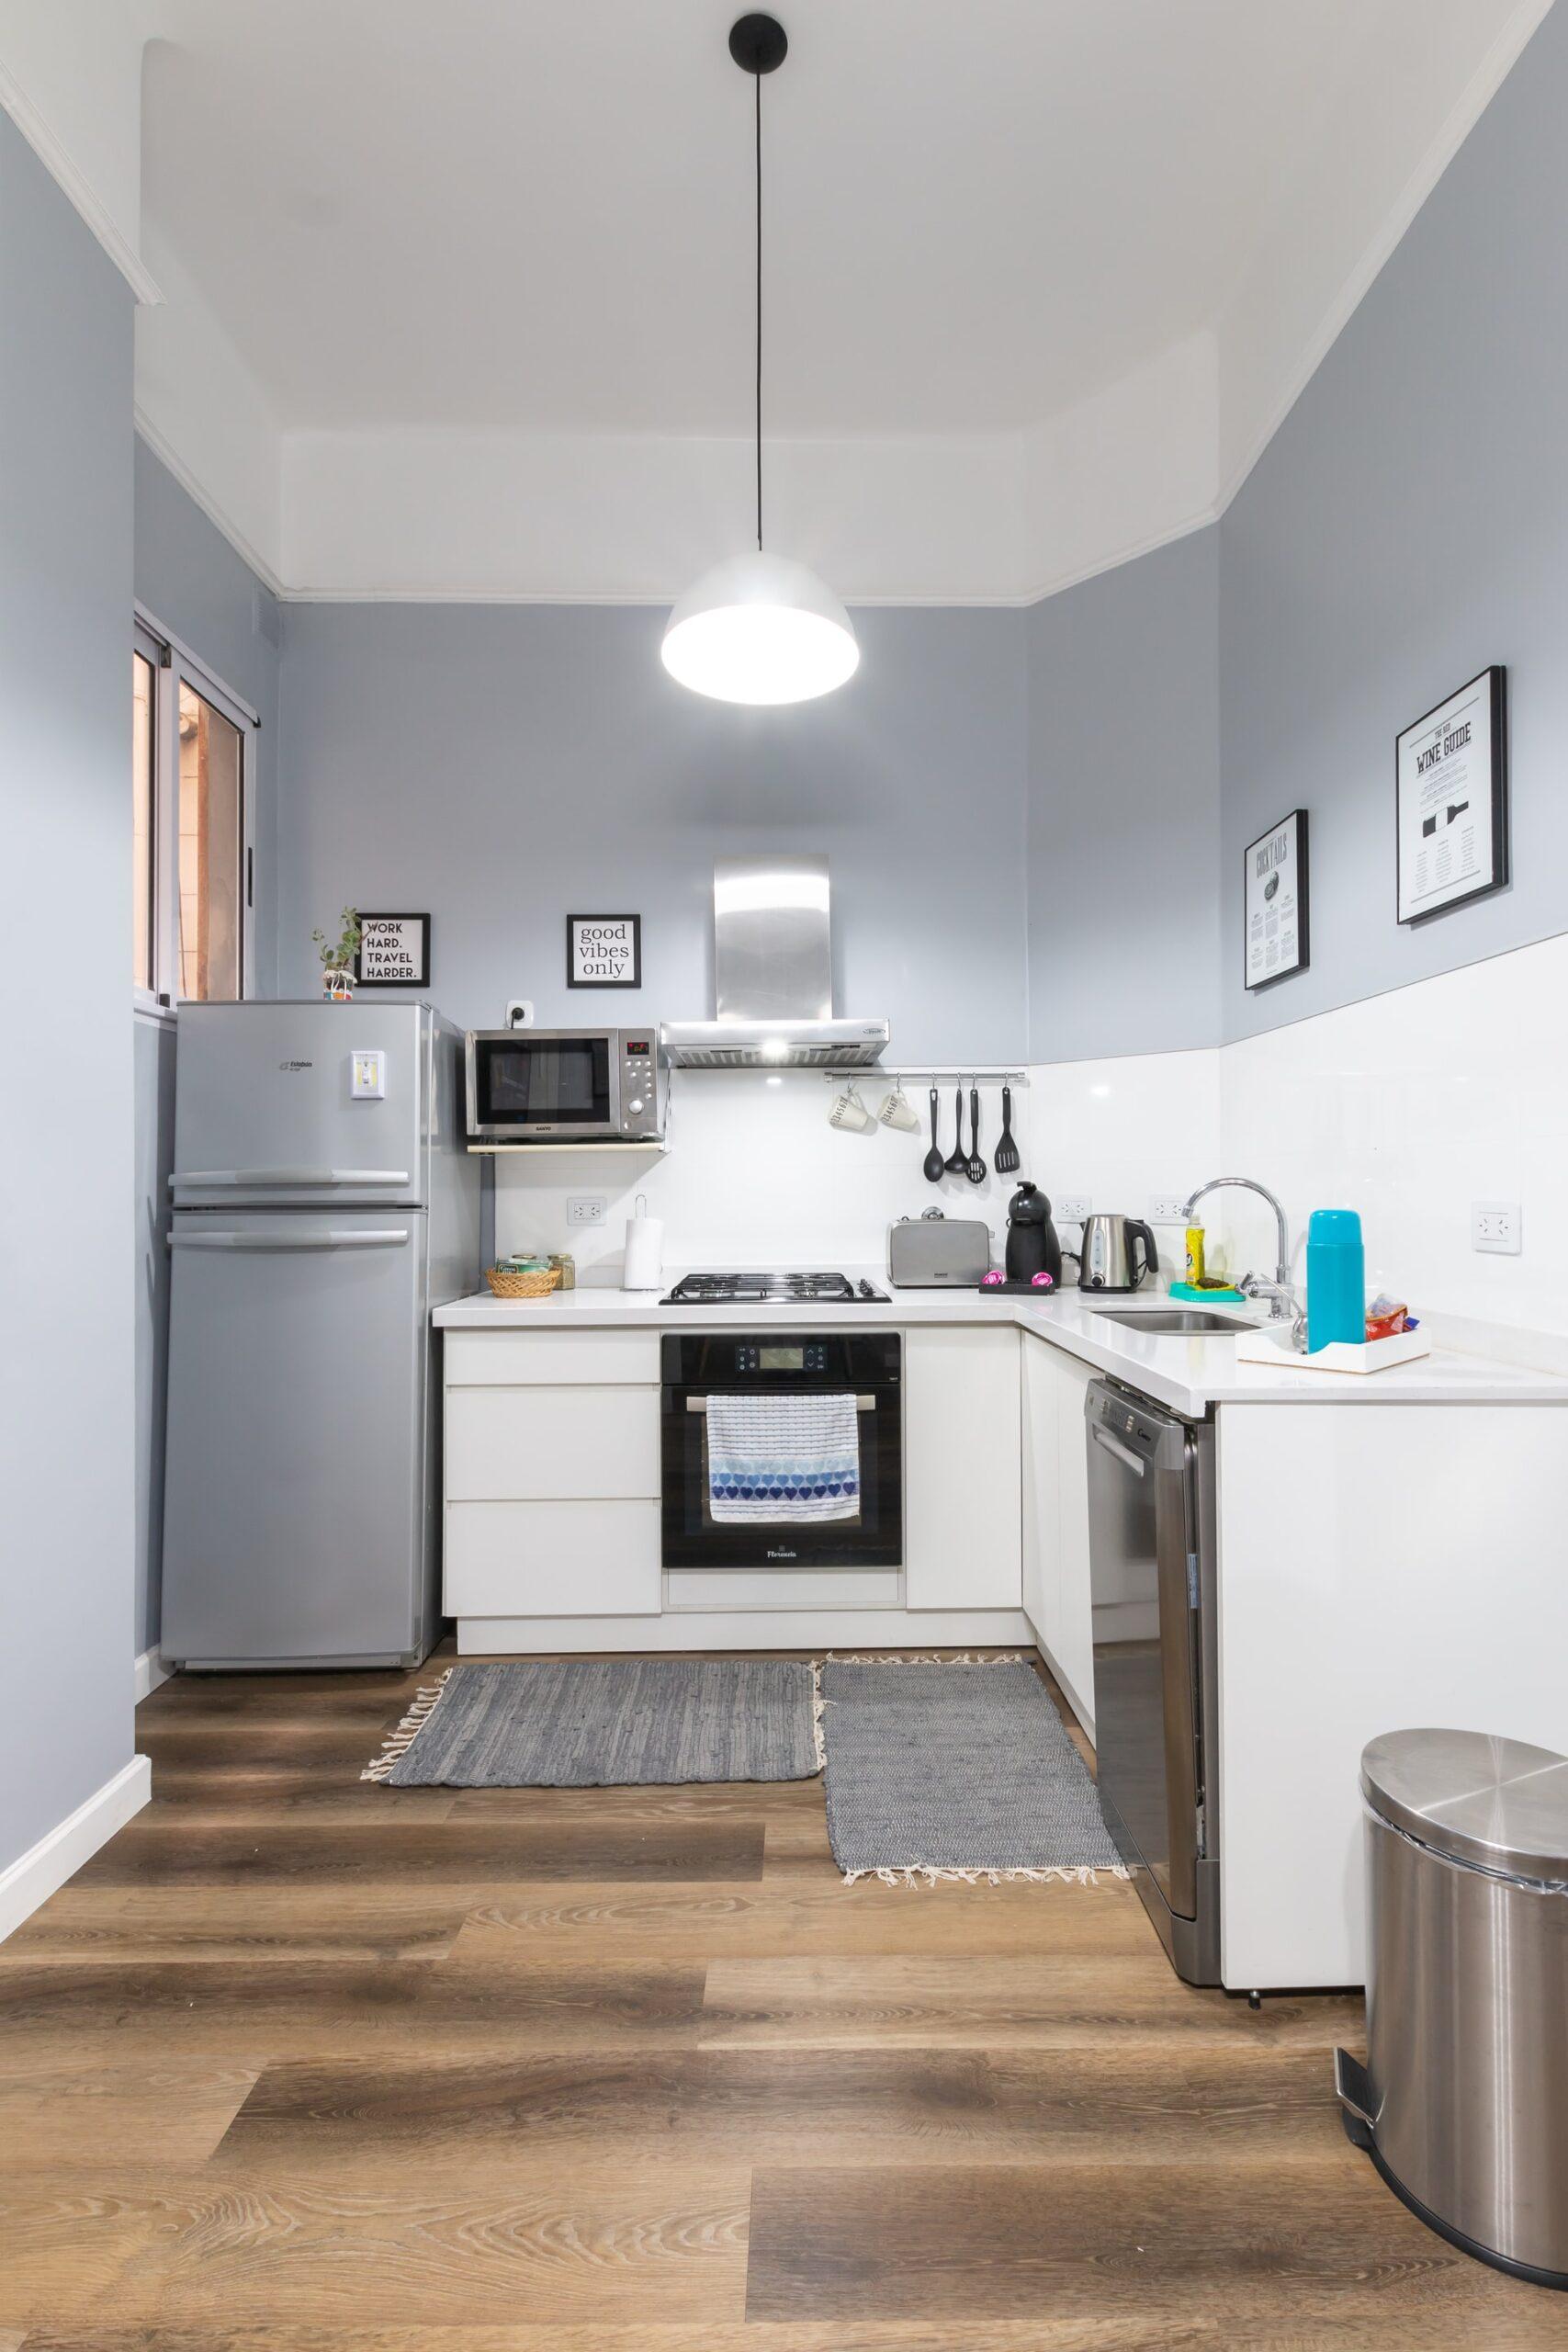 Wet Kitchen Dapur Basah